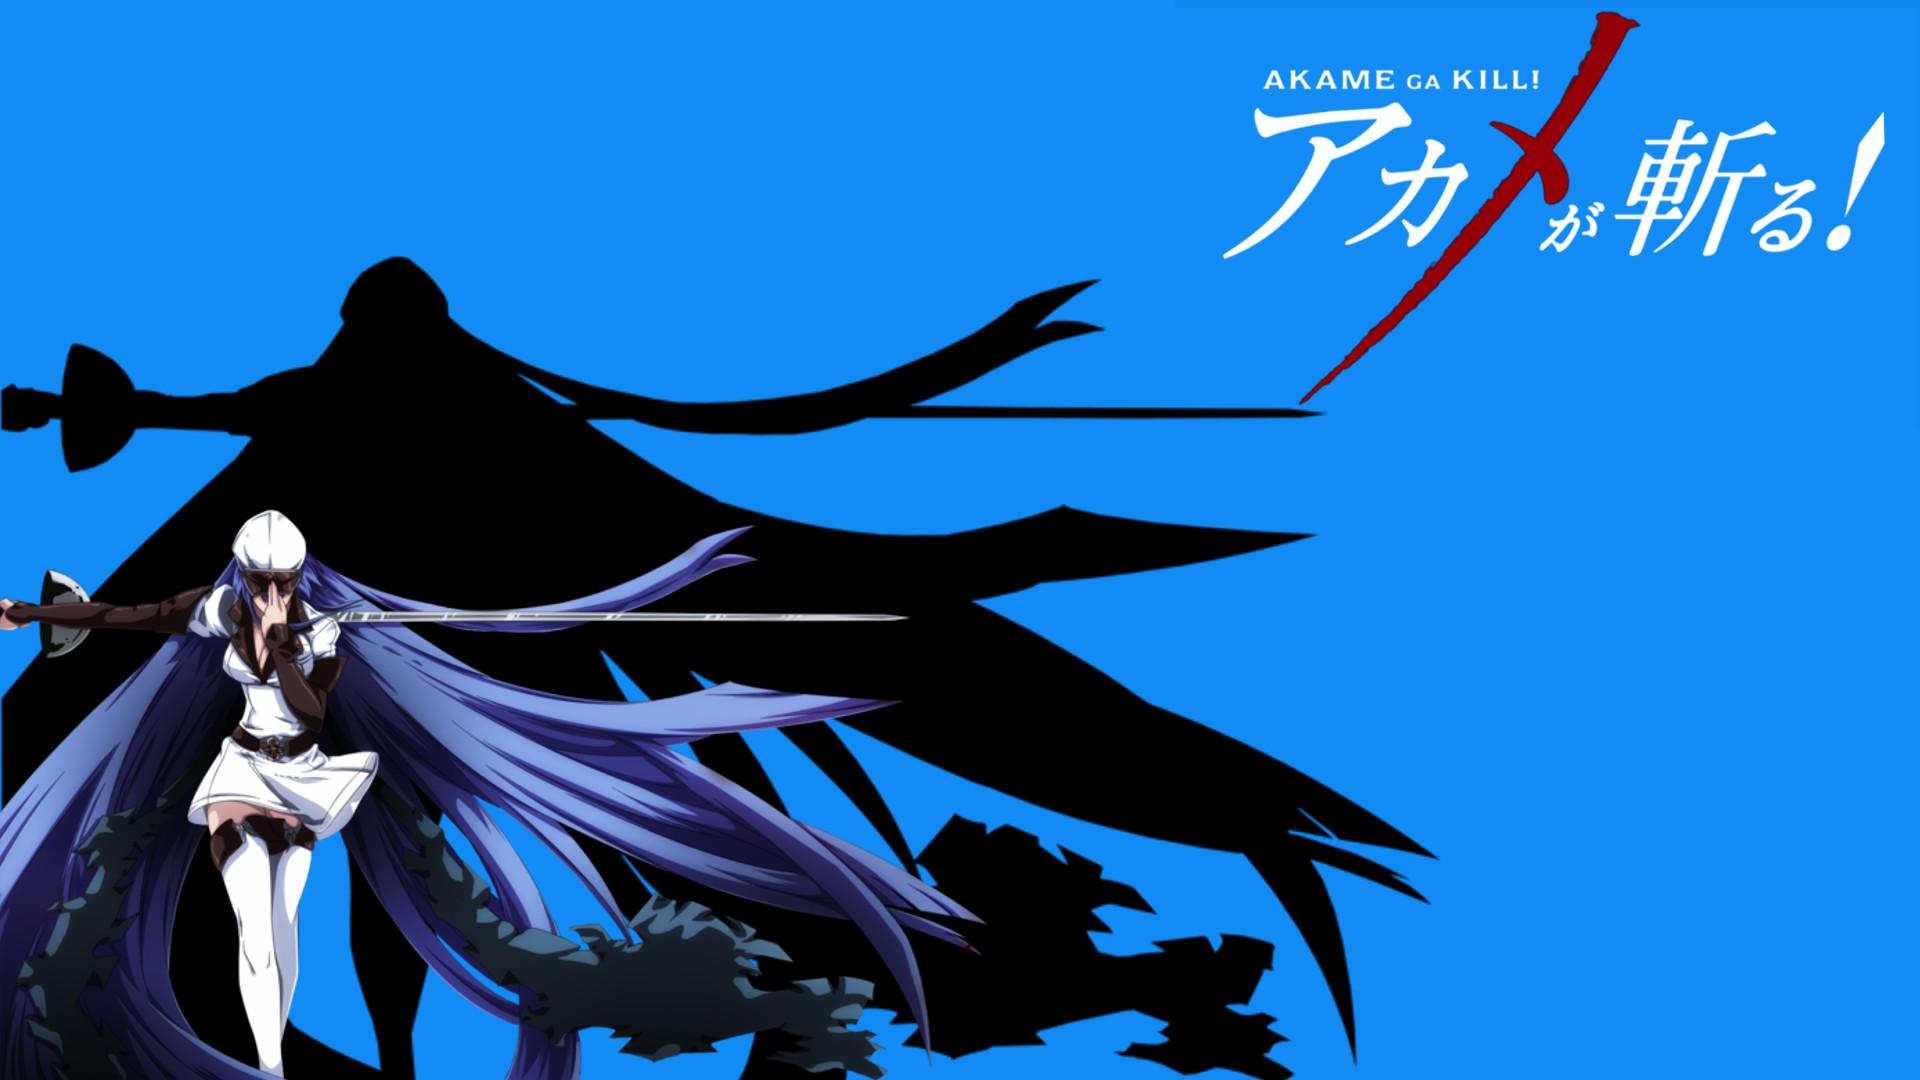 Esdeath, Akame Ga Kill! robot, Xenogears Wallpaper HD